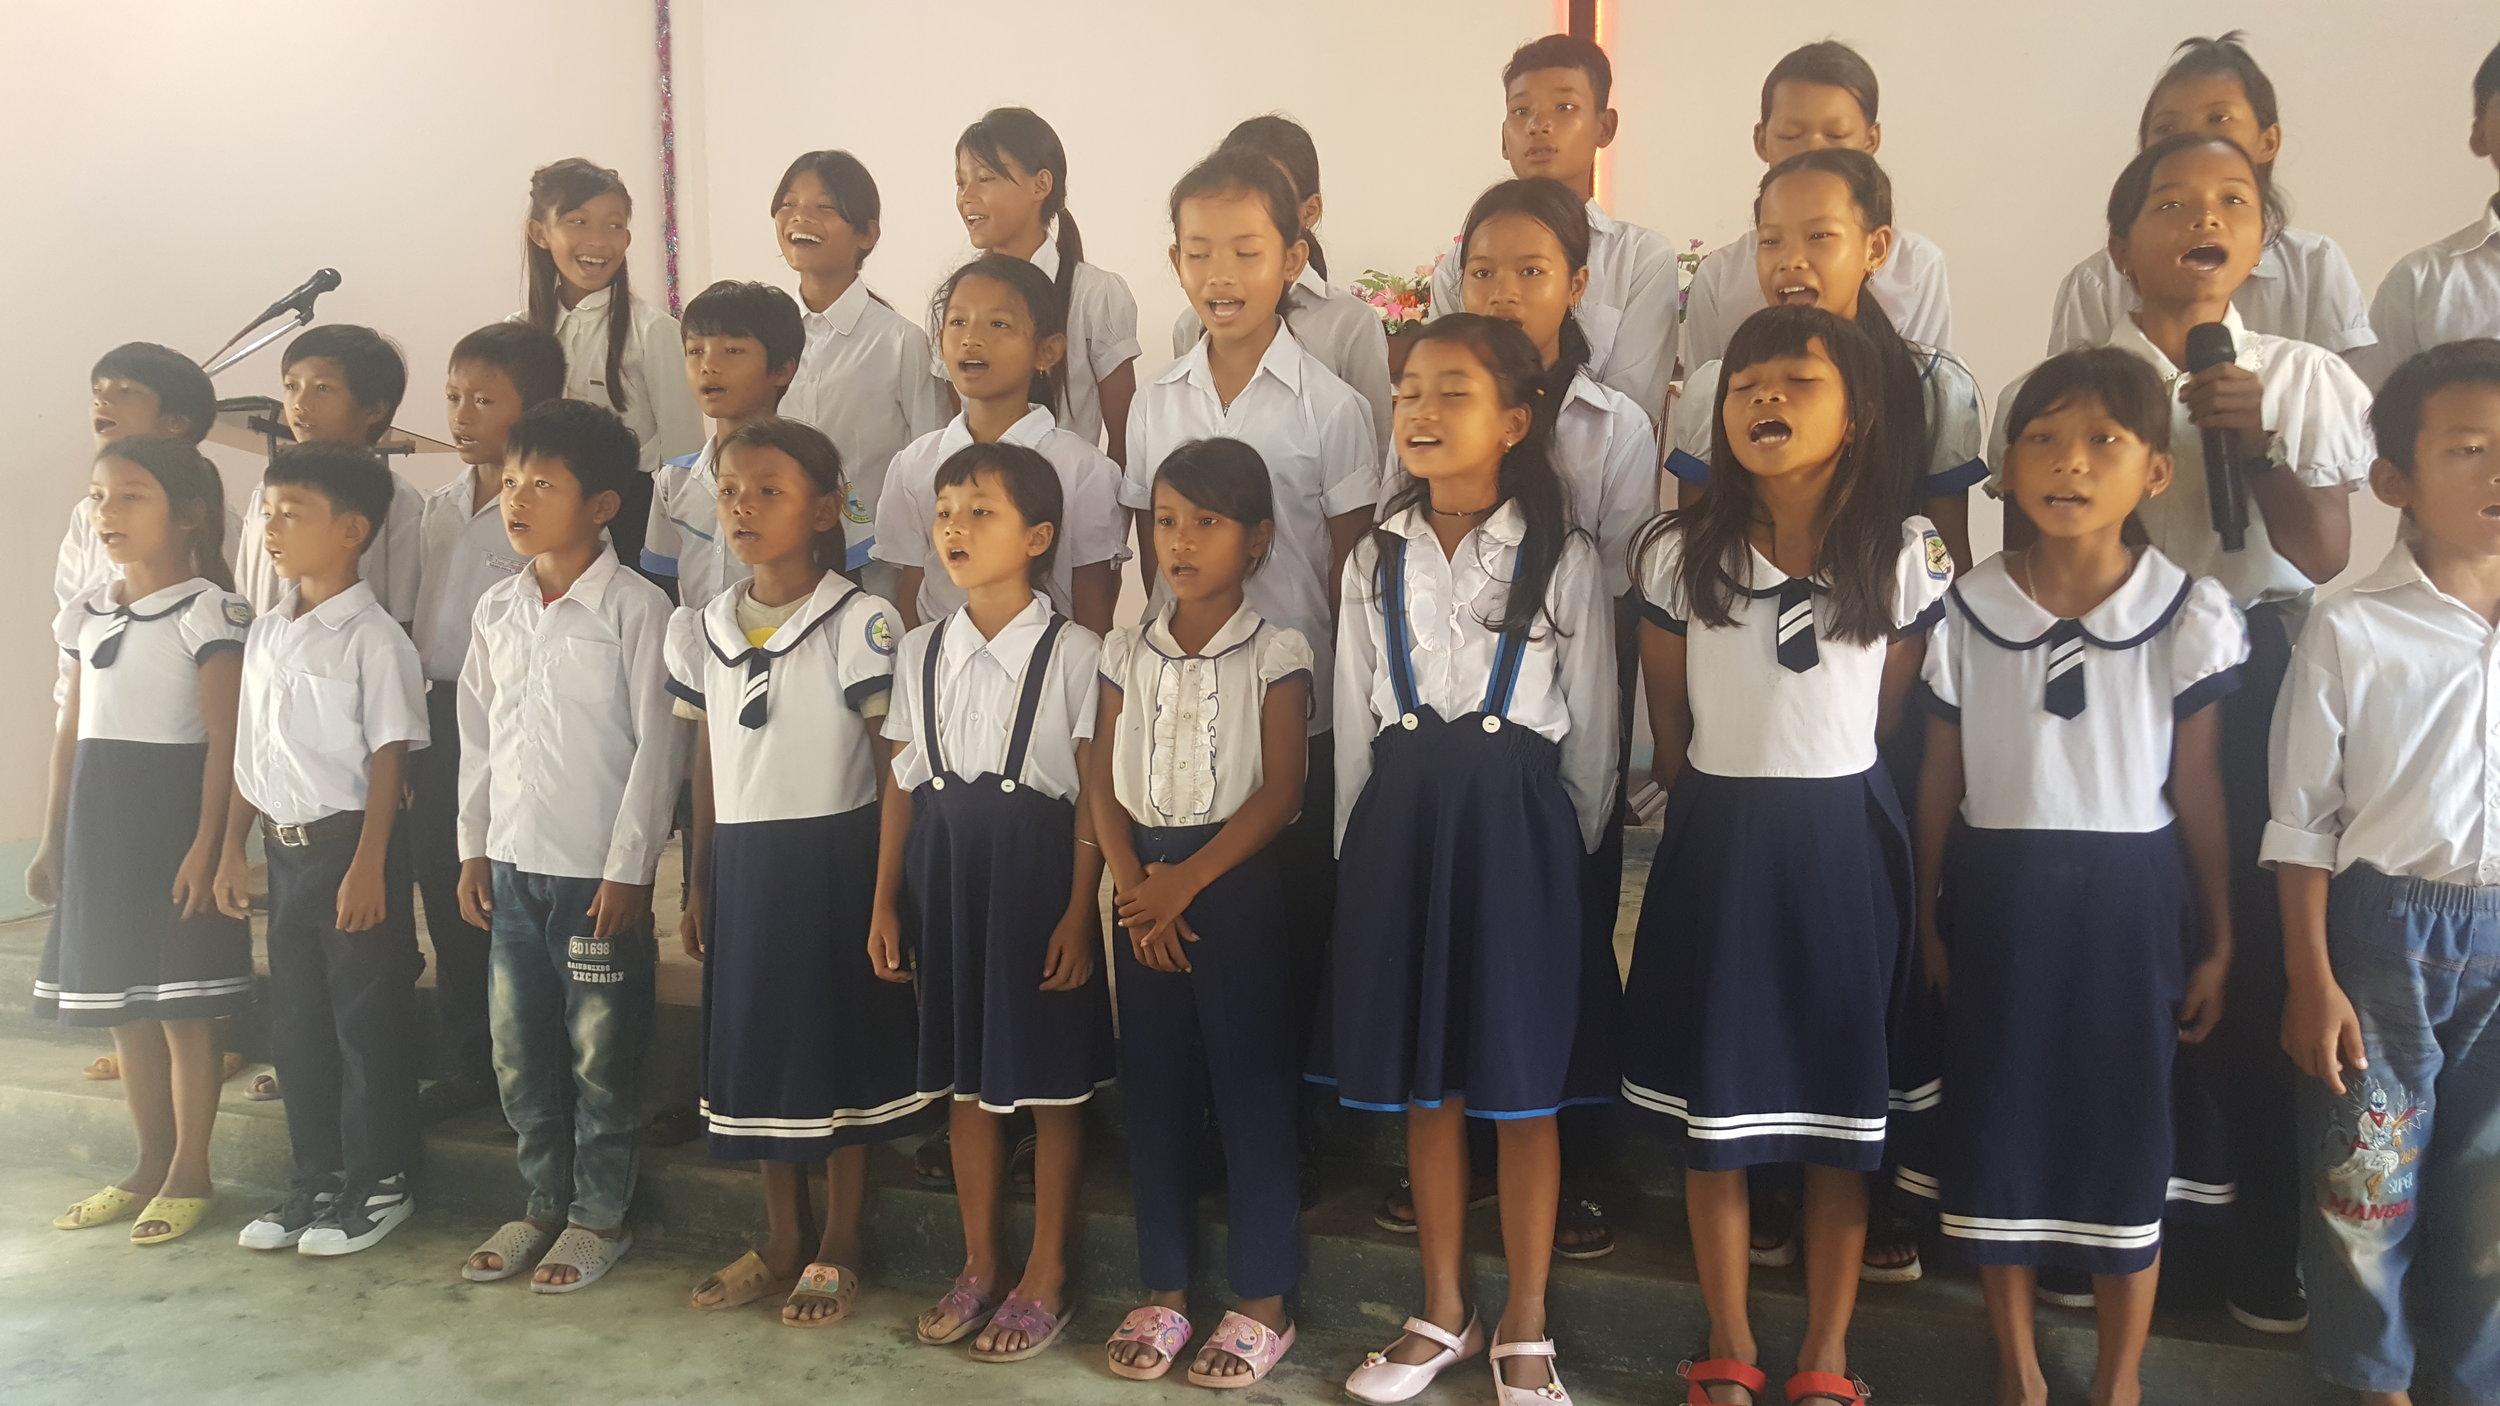 Praising God in Asia